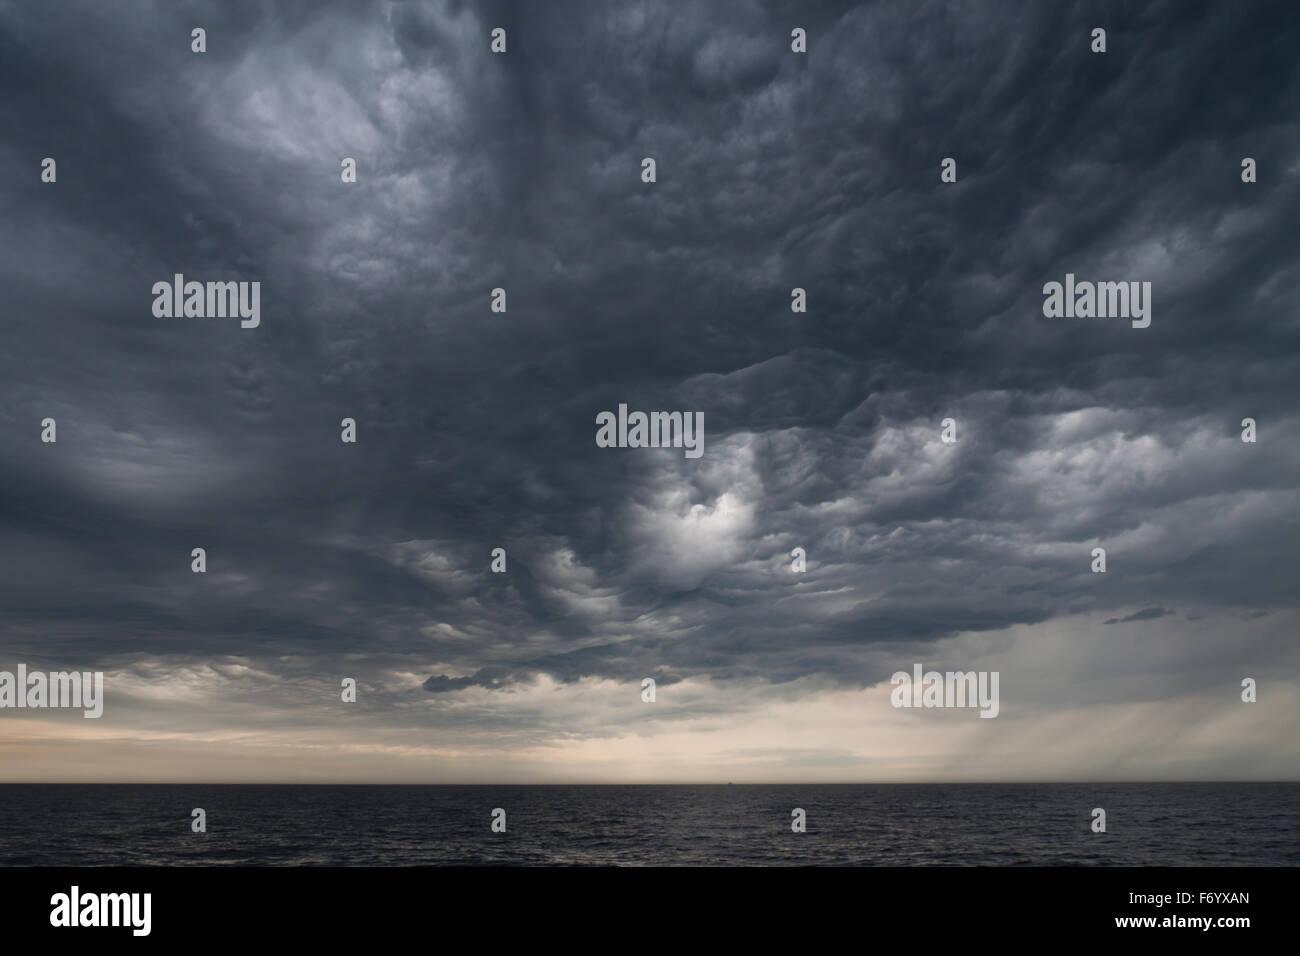 Dramatic sky over the sea - Stock Image